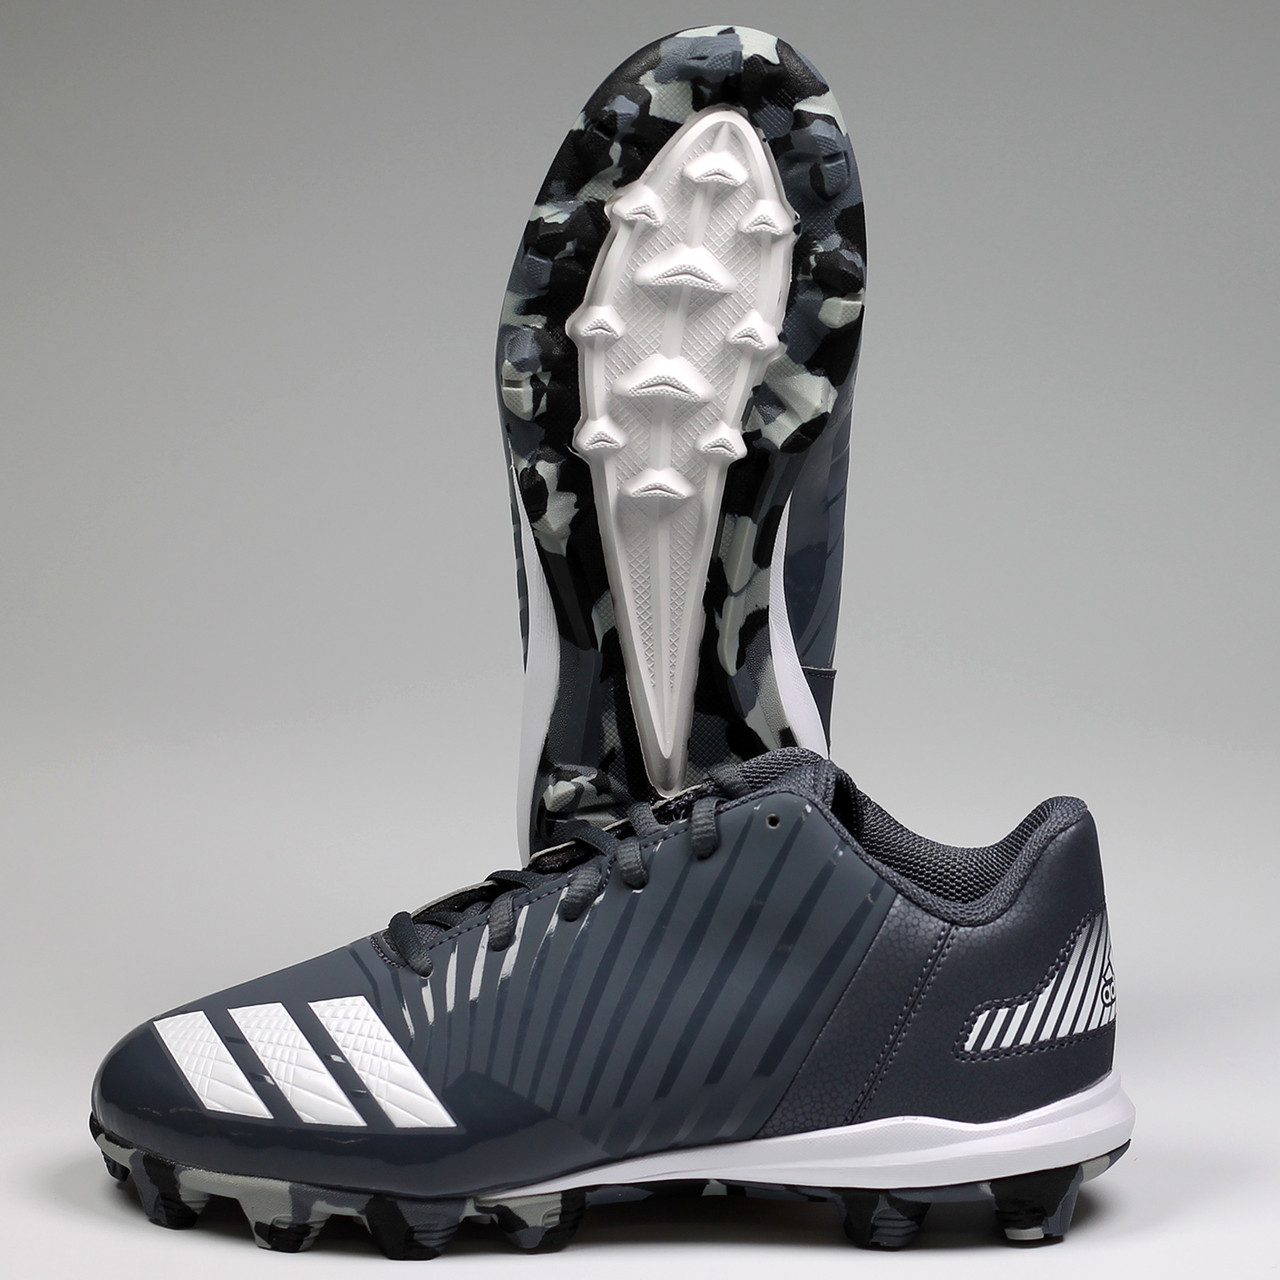 ... Adidas Icon MD Youth Baseball Cleats B39228 - Onyx bde407b05dc